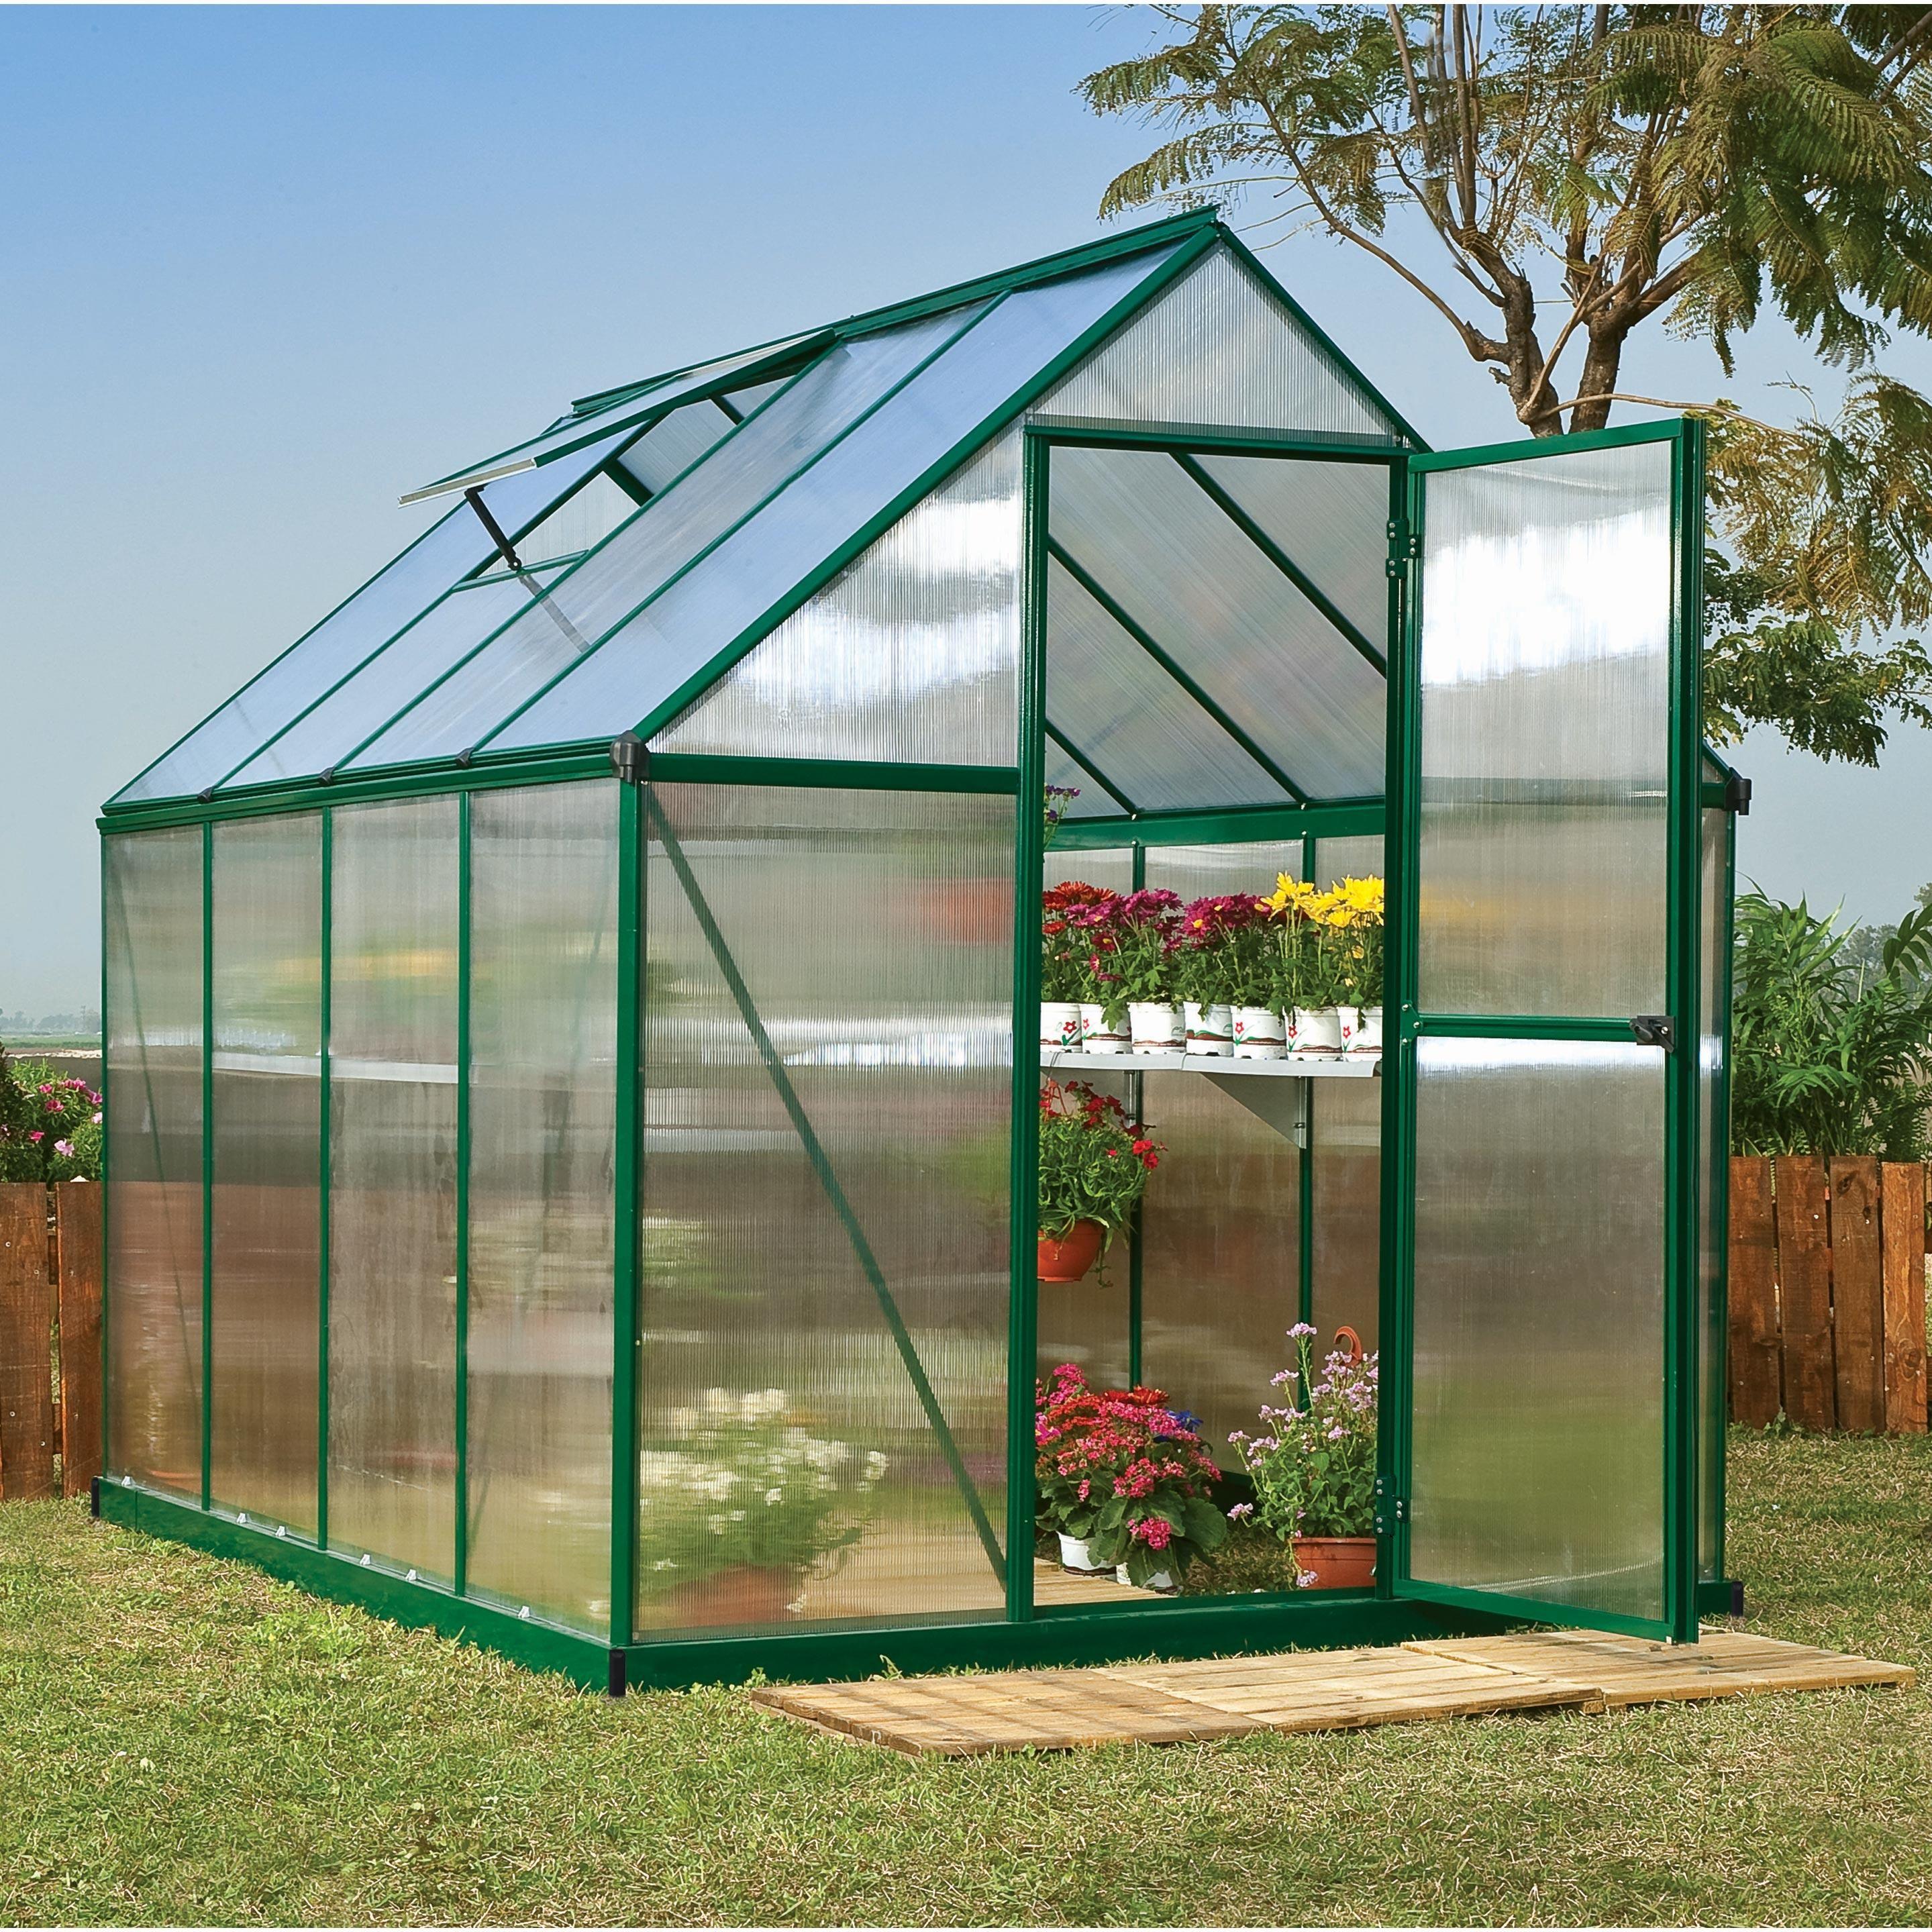 Serre De Jardin Mythos 4 5 M Aluminium Et Polycarbonate Double Parois Palram En 2020 Serre Jardin Maison Verte Et Jardinage Bio